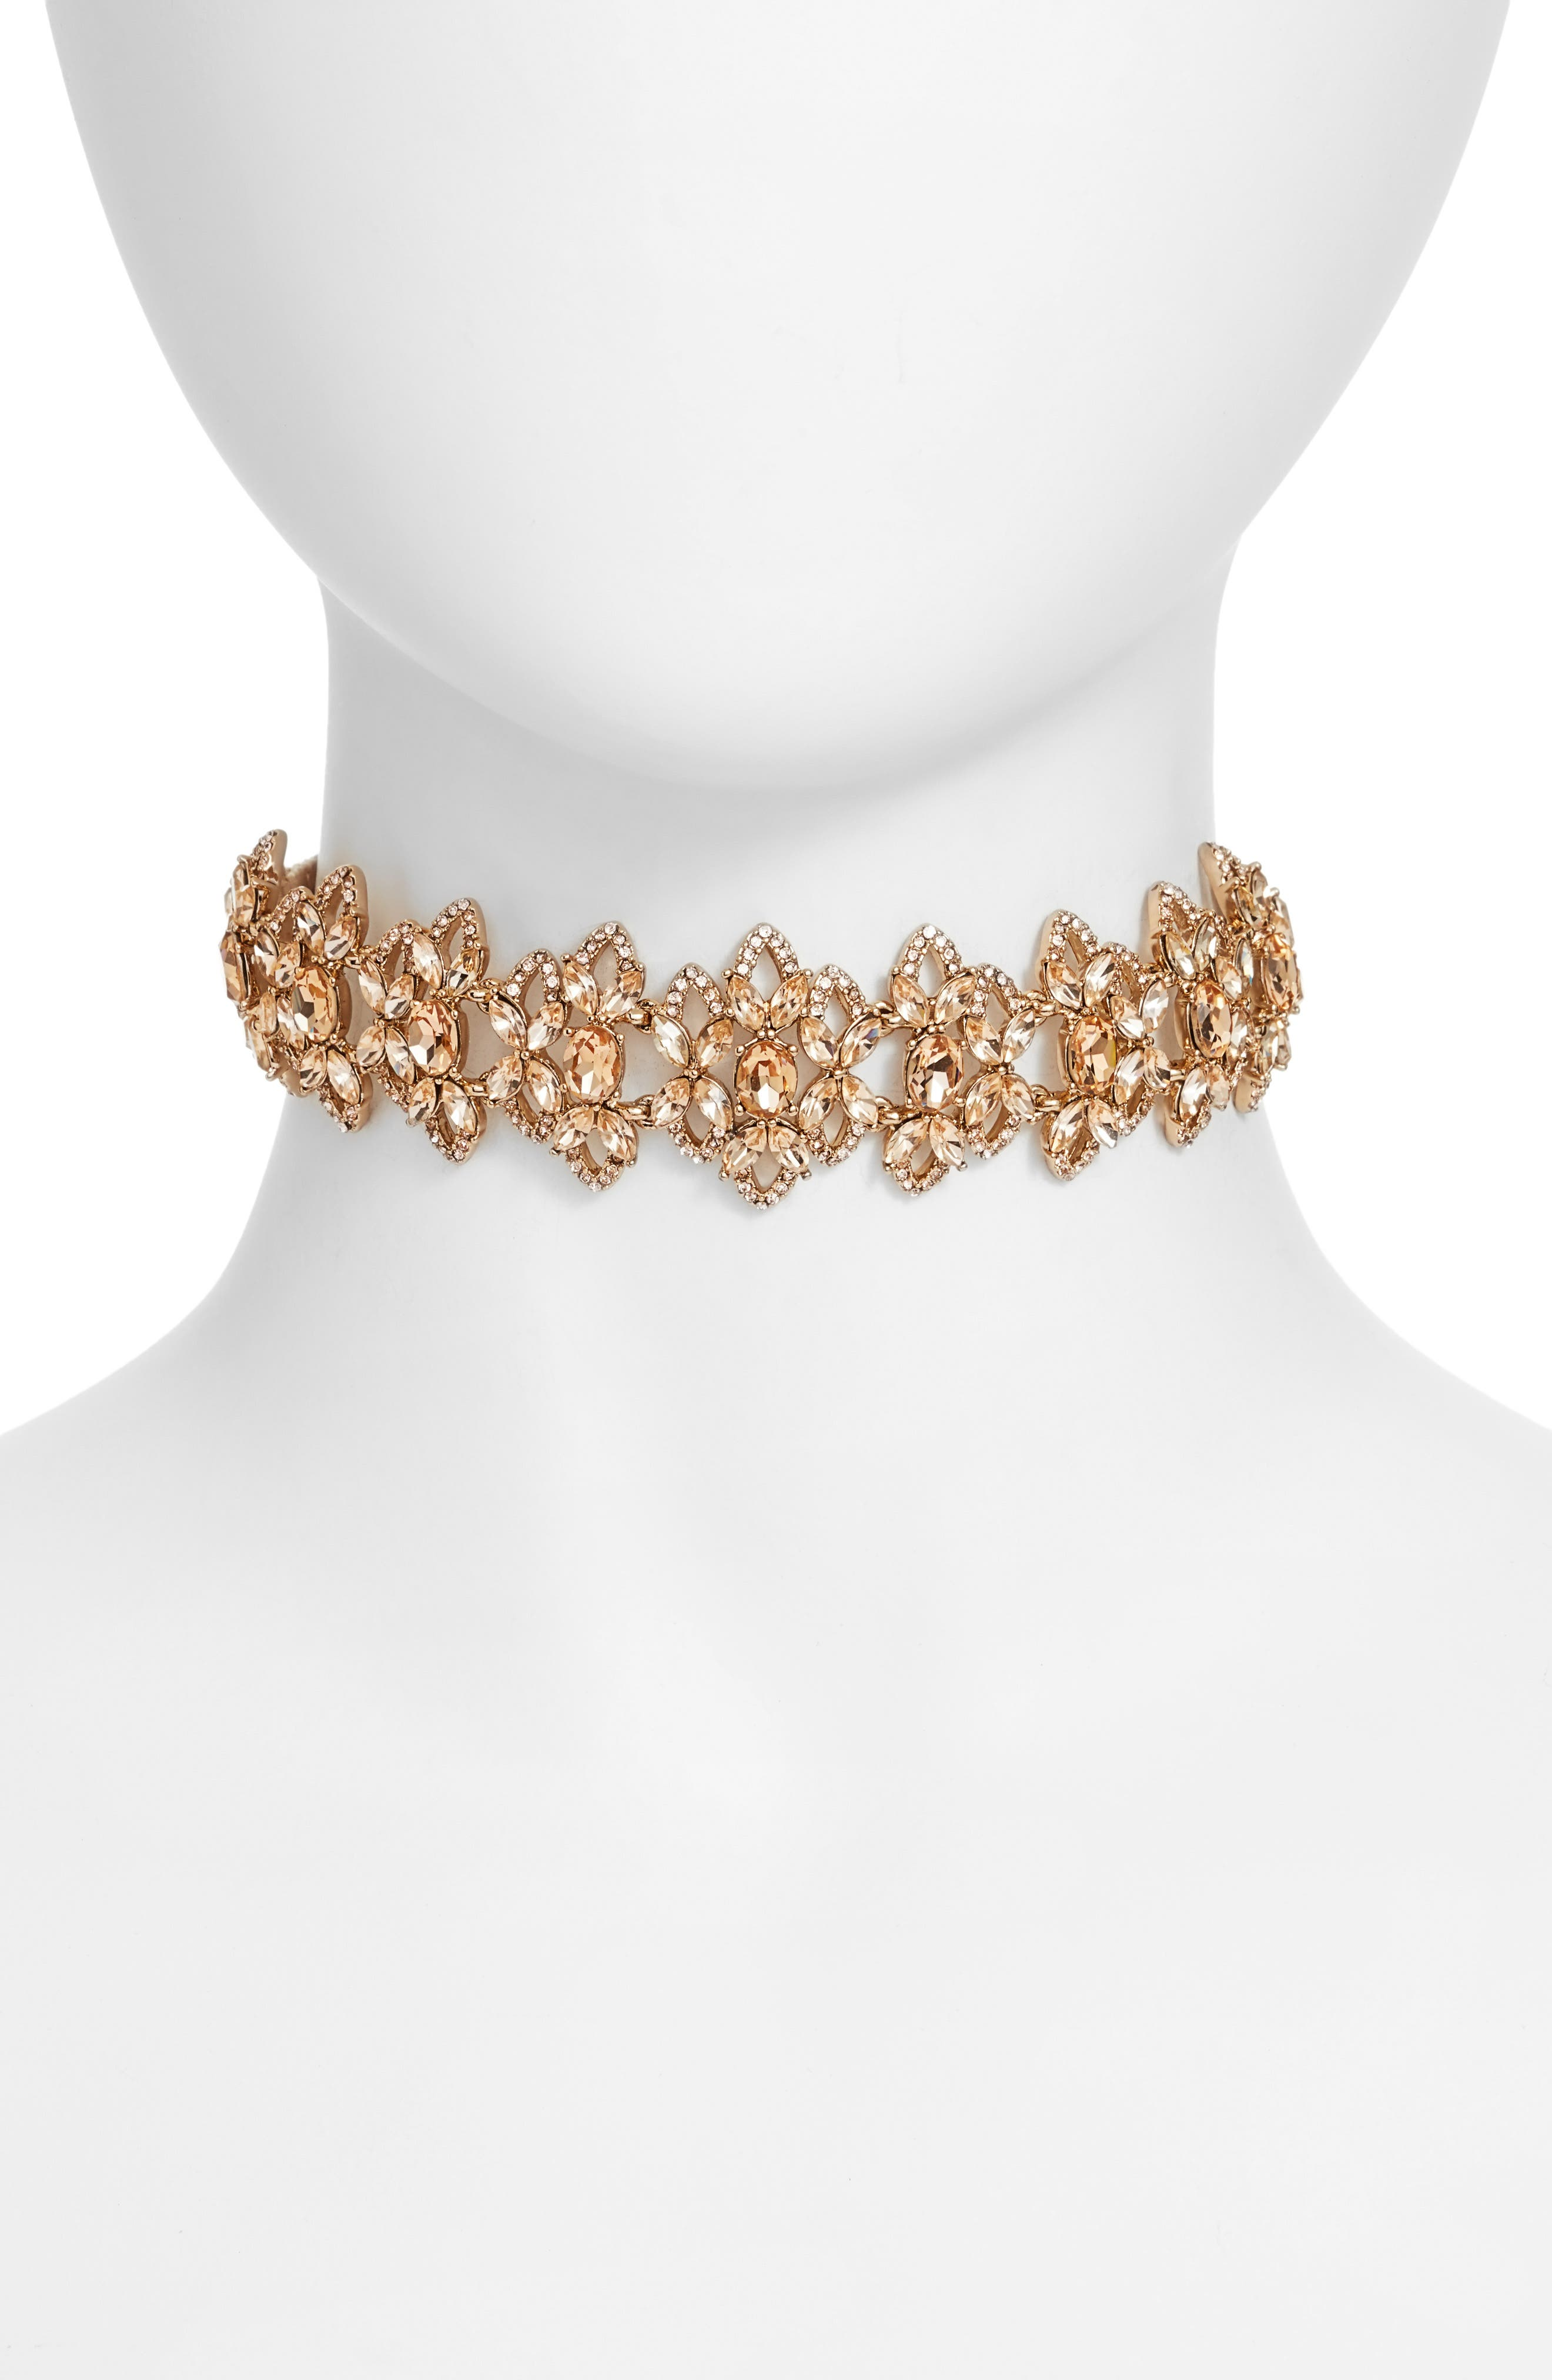 Jenny Packham 4-Way Convertible Necklace